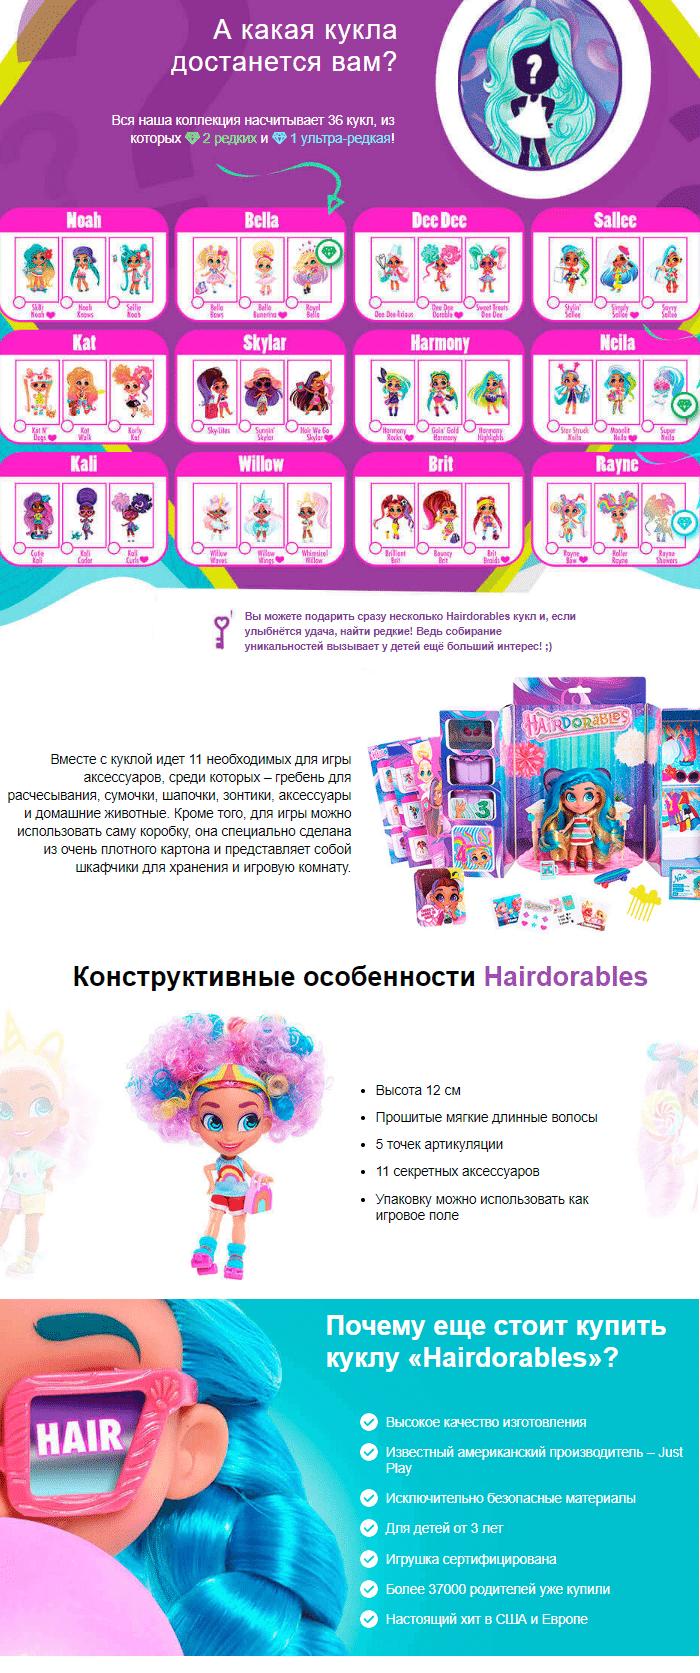 Кукла Hairdorables (стильные подружки) - фото pic_8e60a2c64d30c7799cc23fe3859a9f8d_1920x9000_1.png